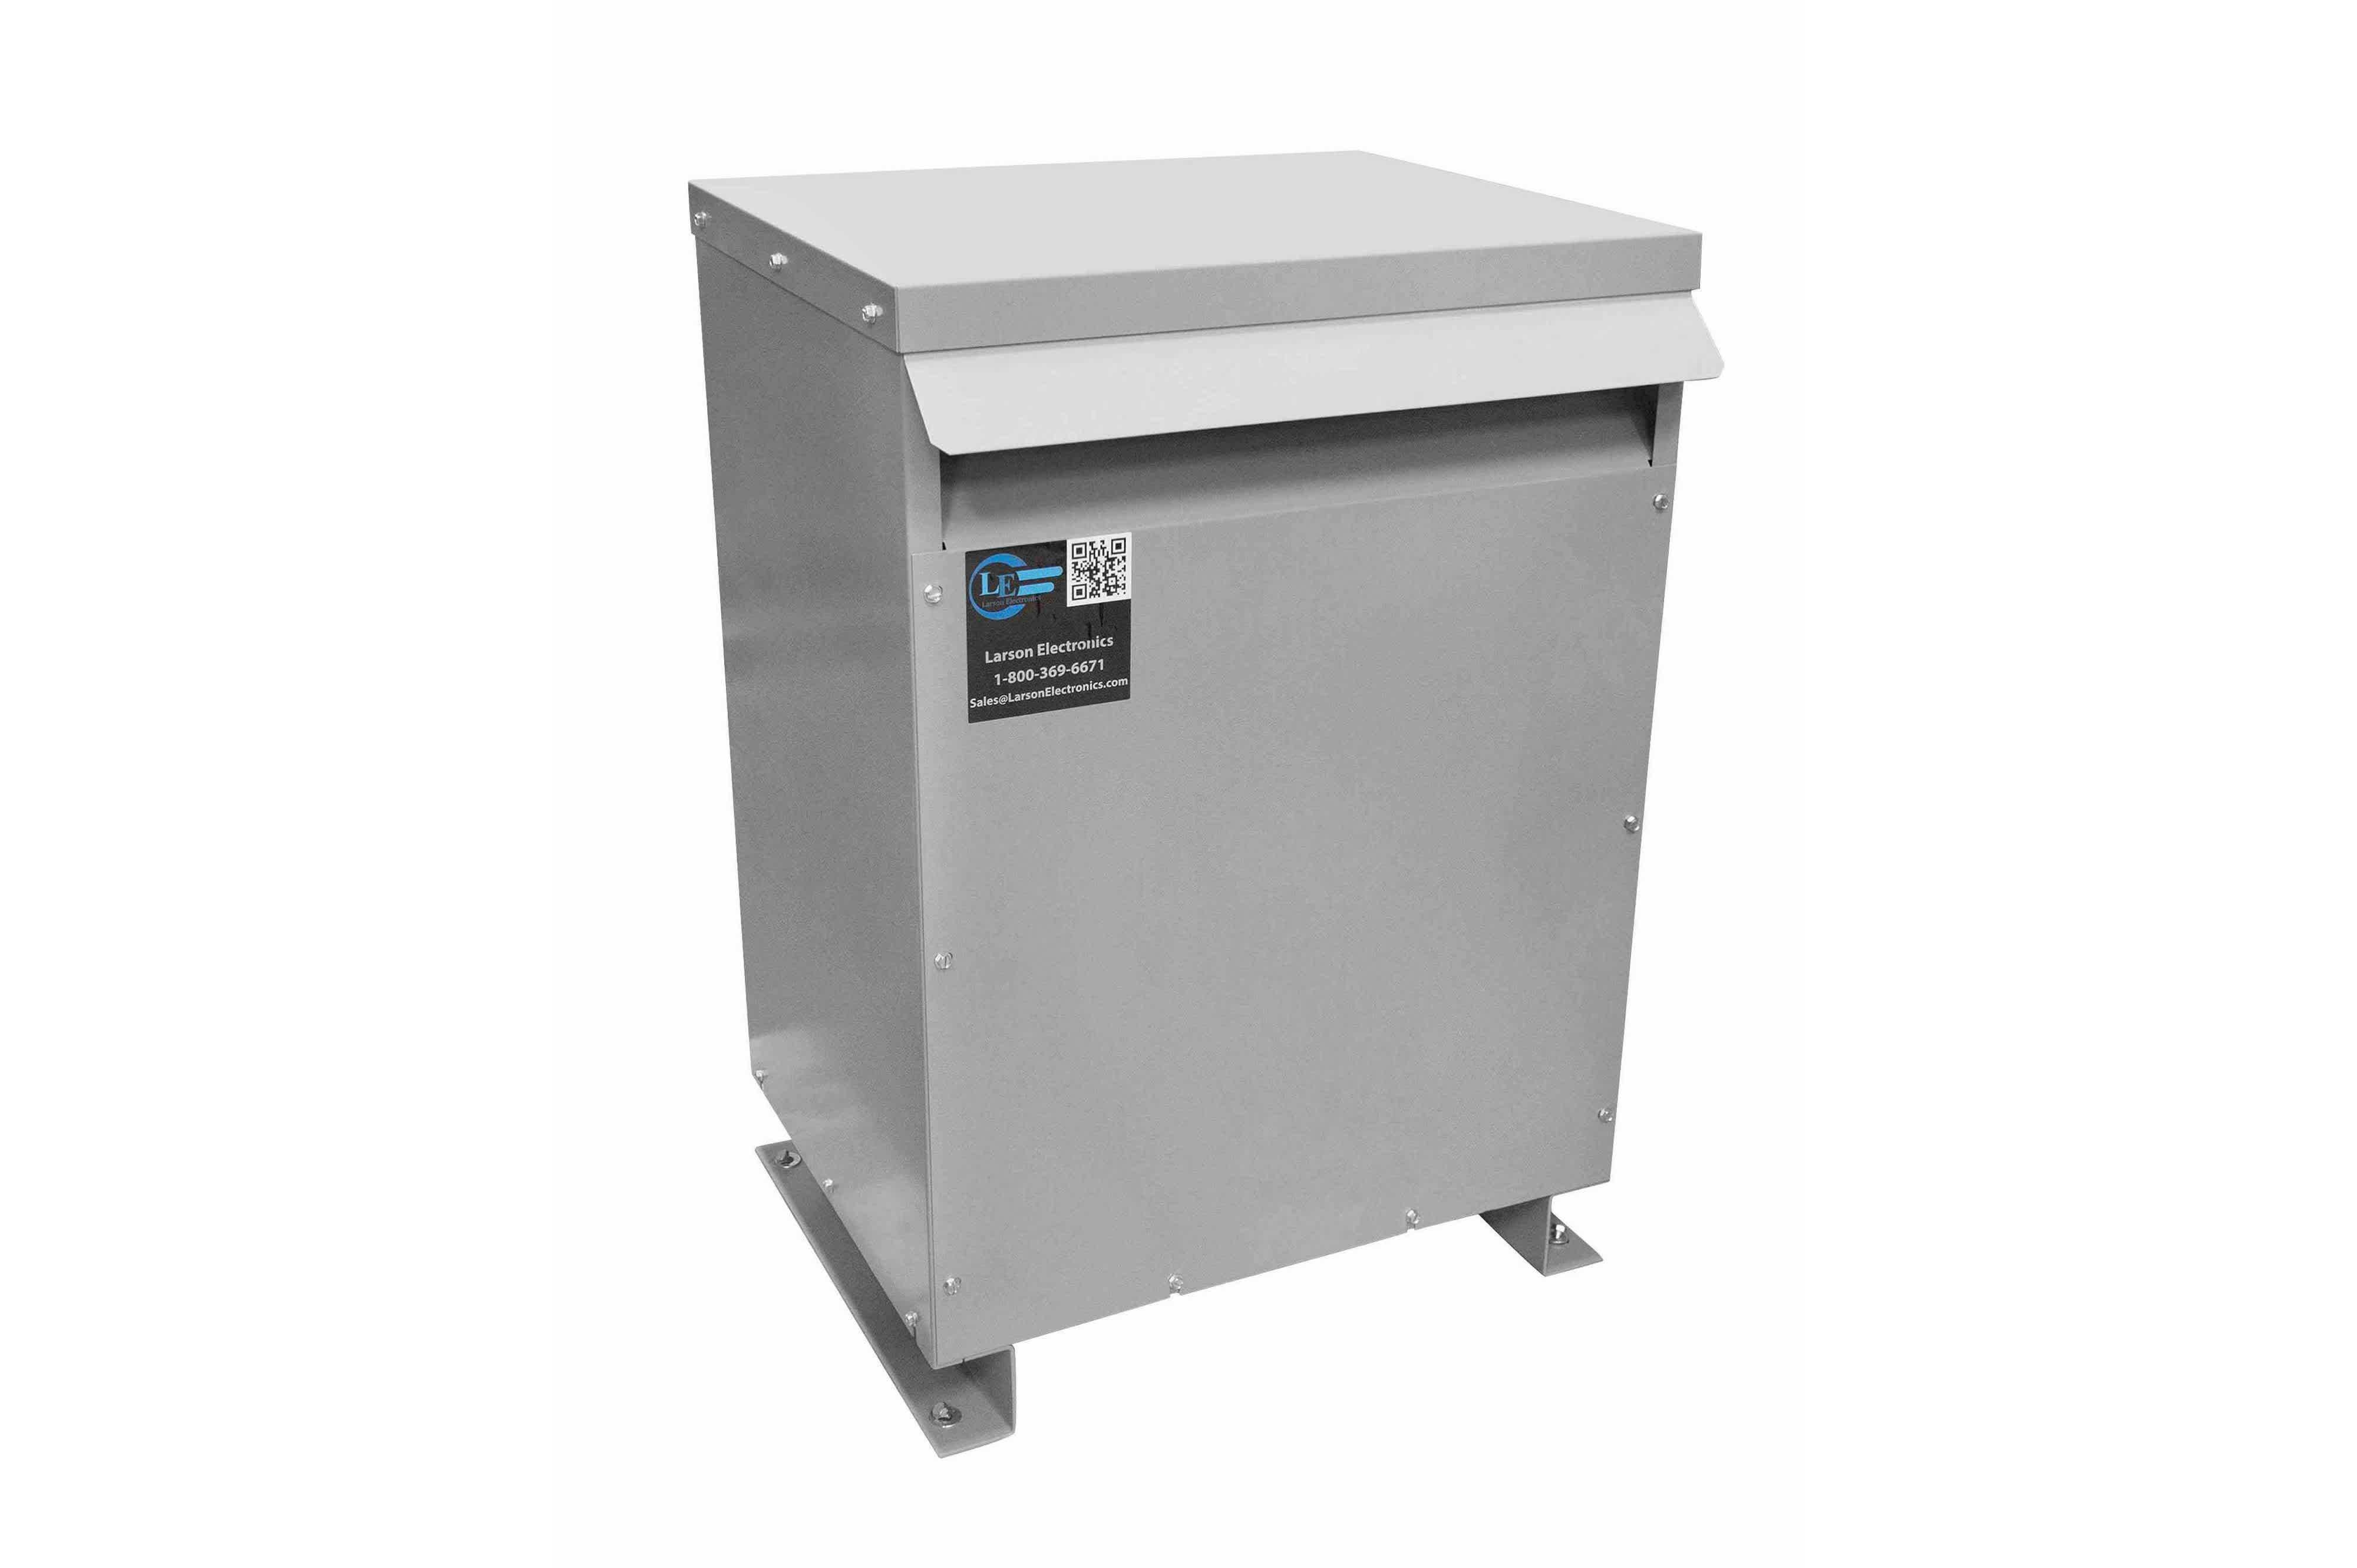 18 kVA 3PH Isolation Transformer, 380V Wye Primary, 208V Delta Secondary, N3R, Ventilated, 60 Hz